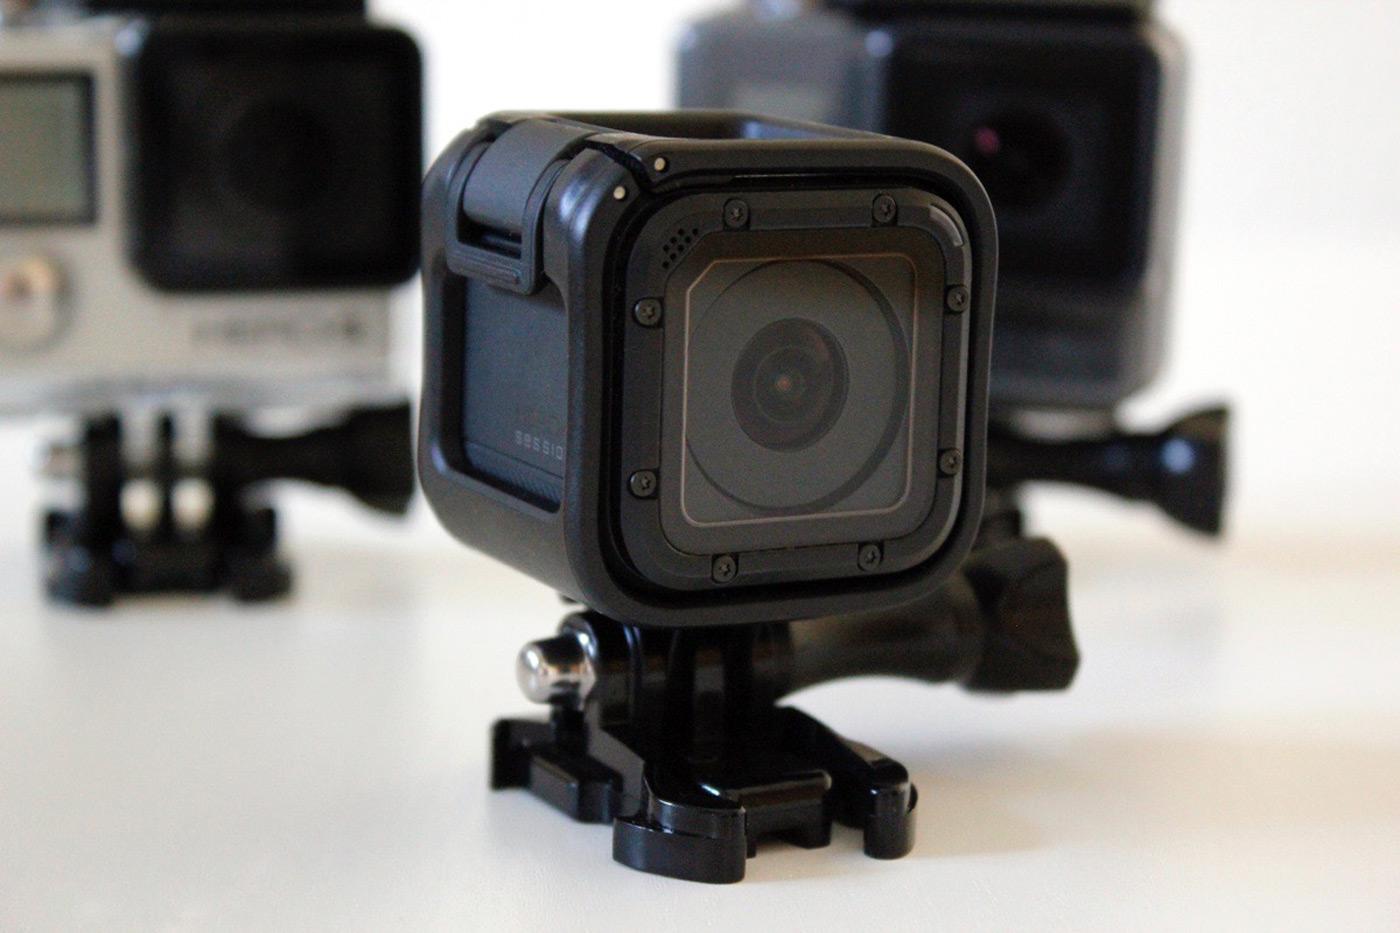 GoPro Hero4 Session 价格减至 US$199!你动心了吗?